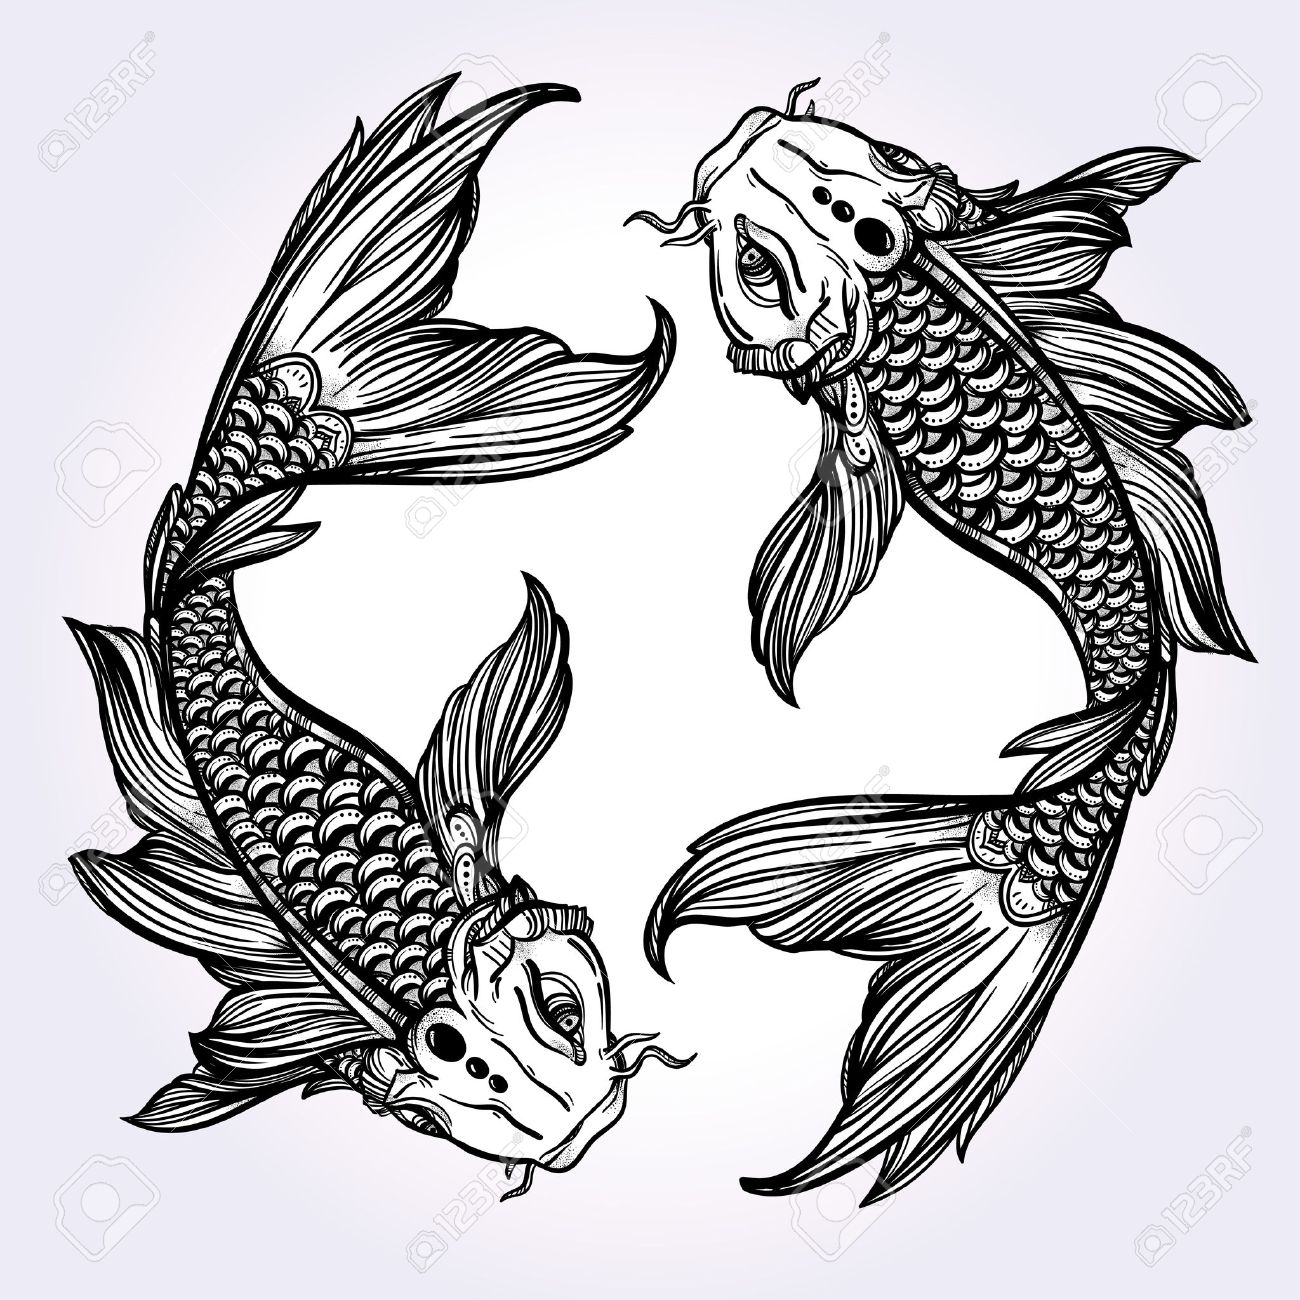 hand drawn romantic beautiful line art of fish koi carp symbol